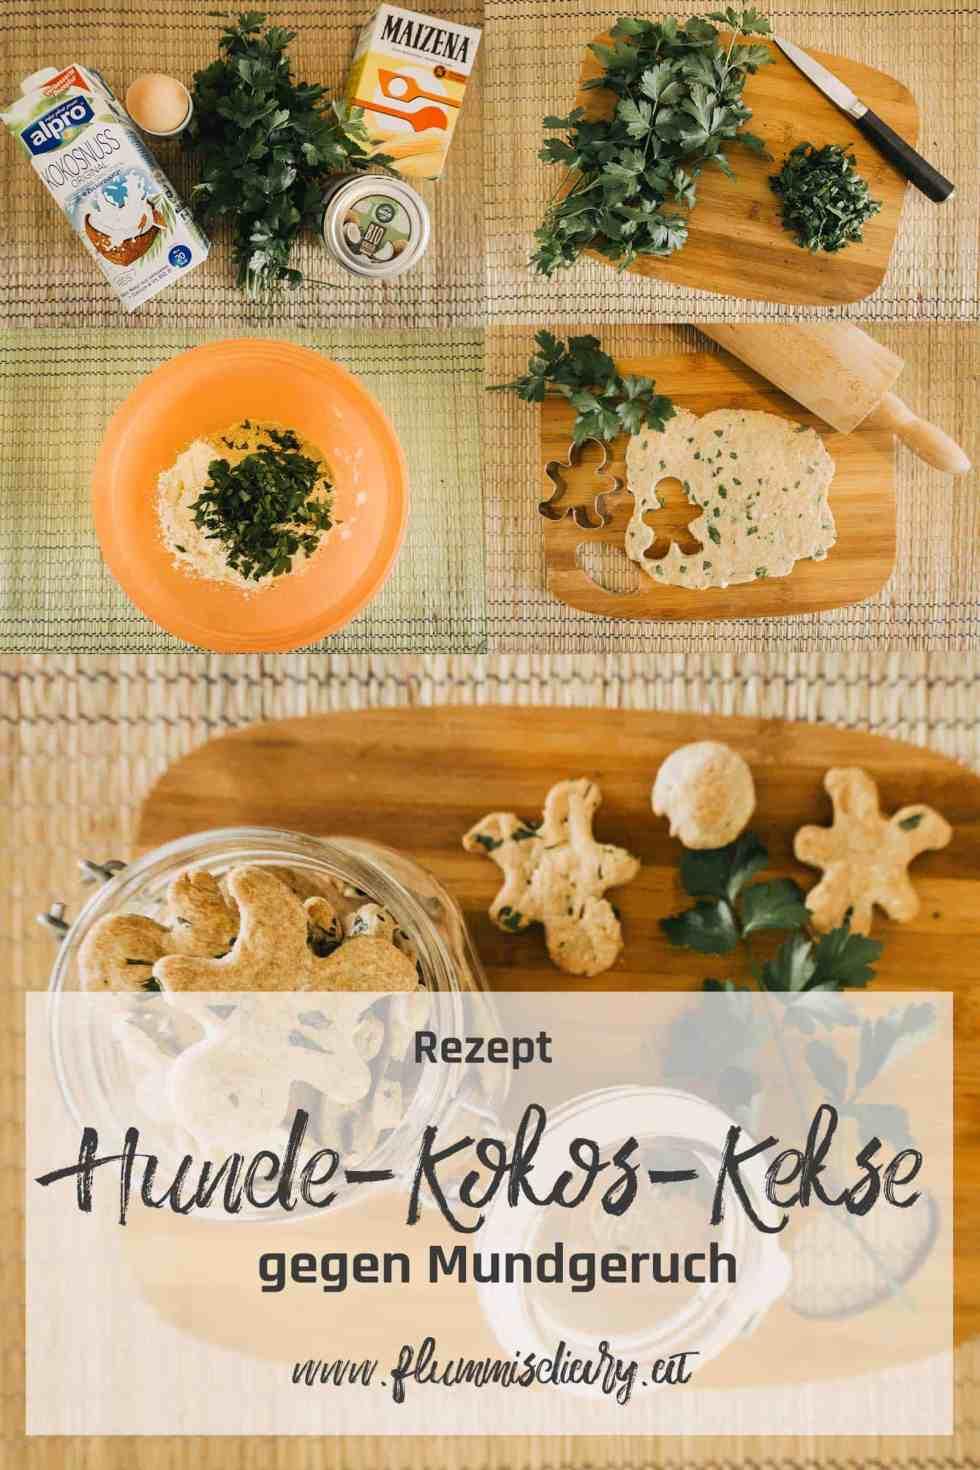 mundgeruch-beim-hund-anleitung-hunde-kokos-kekse